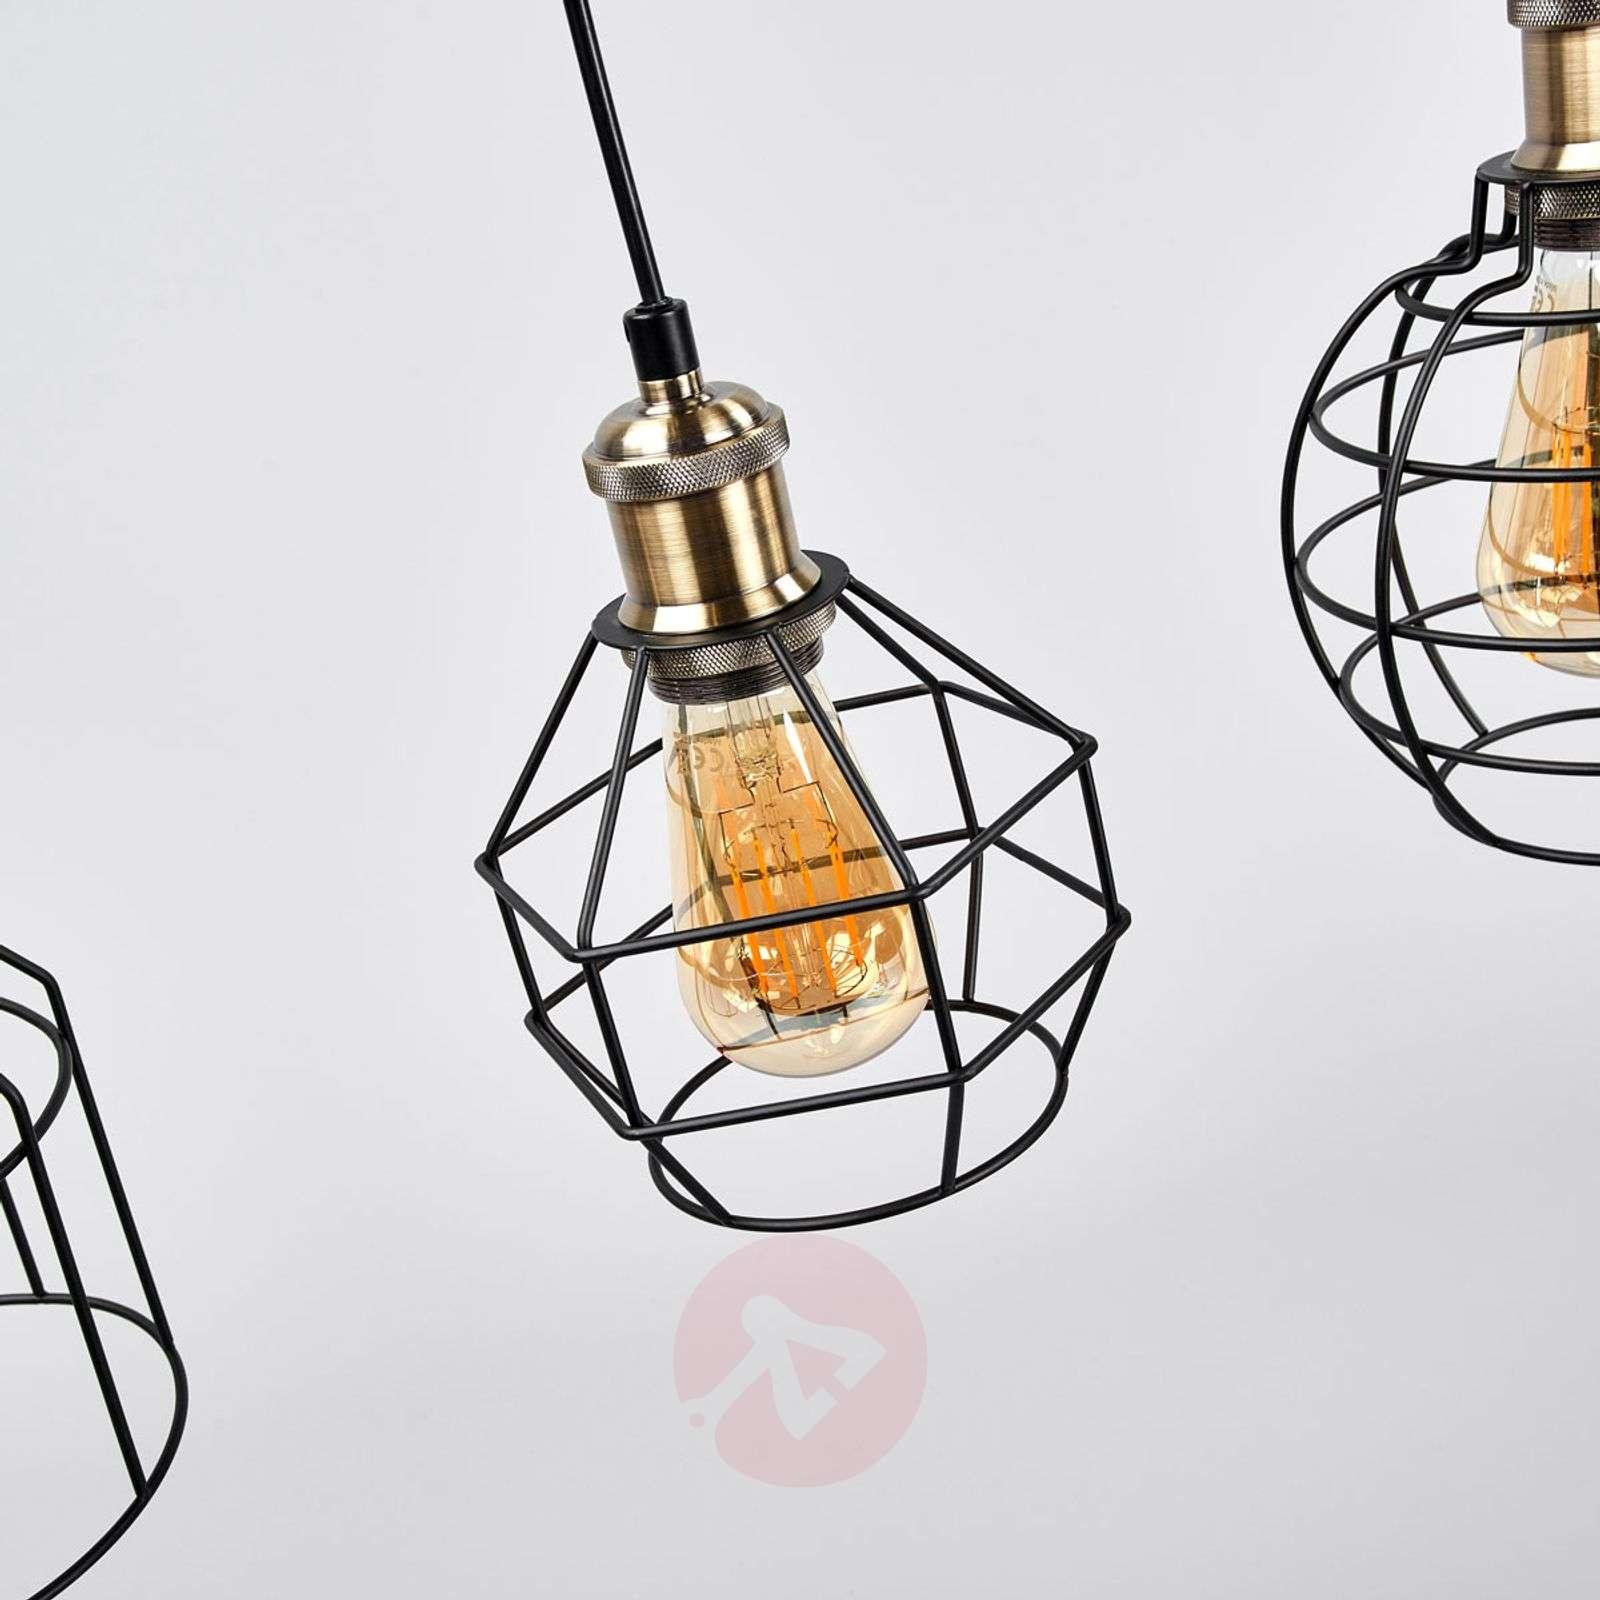 Attractive pendant lamp Alberta-9639061-02